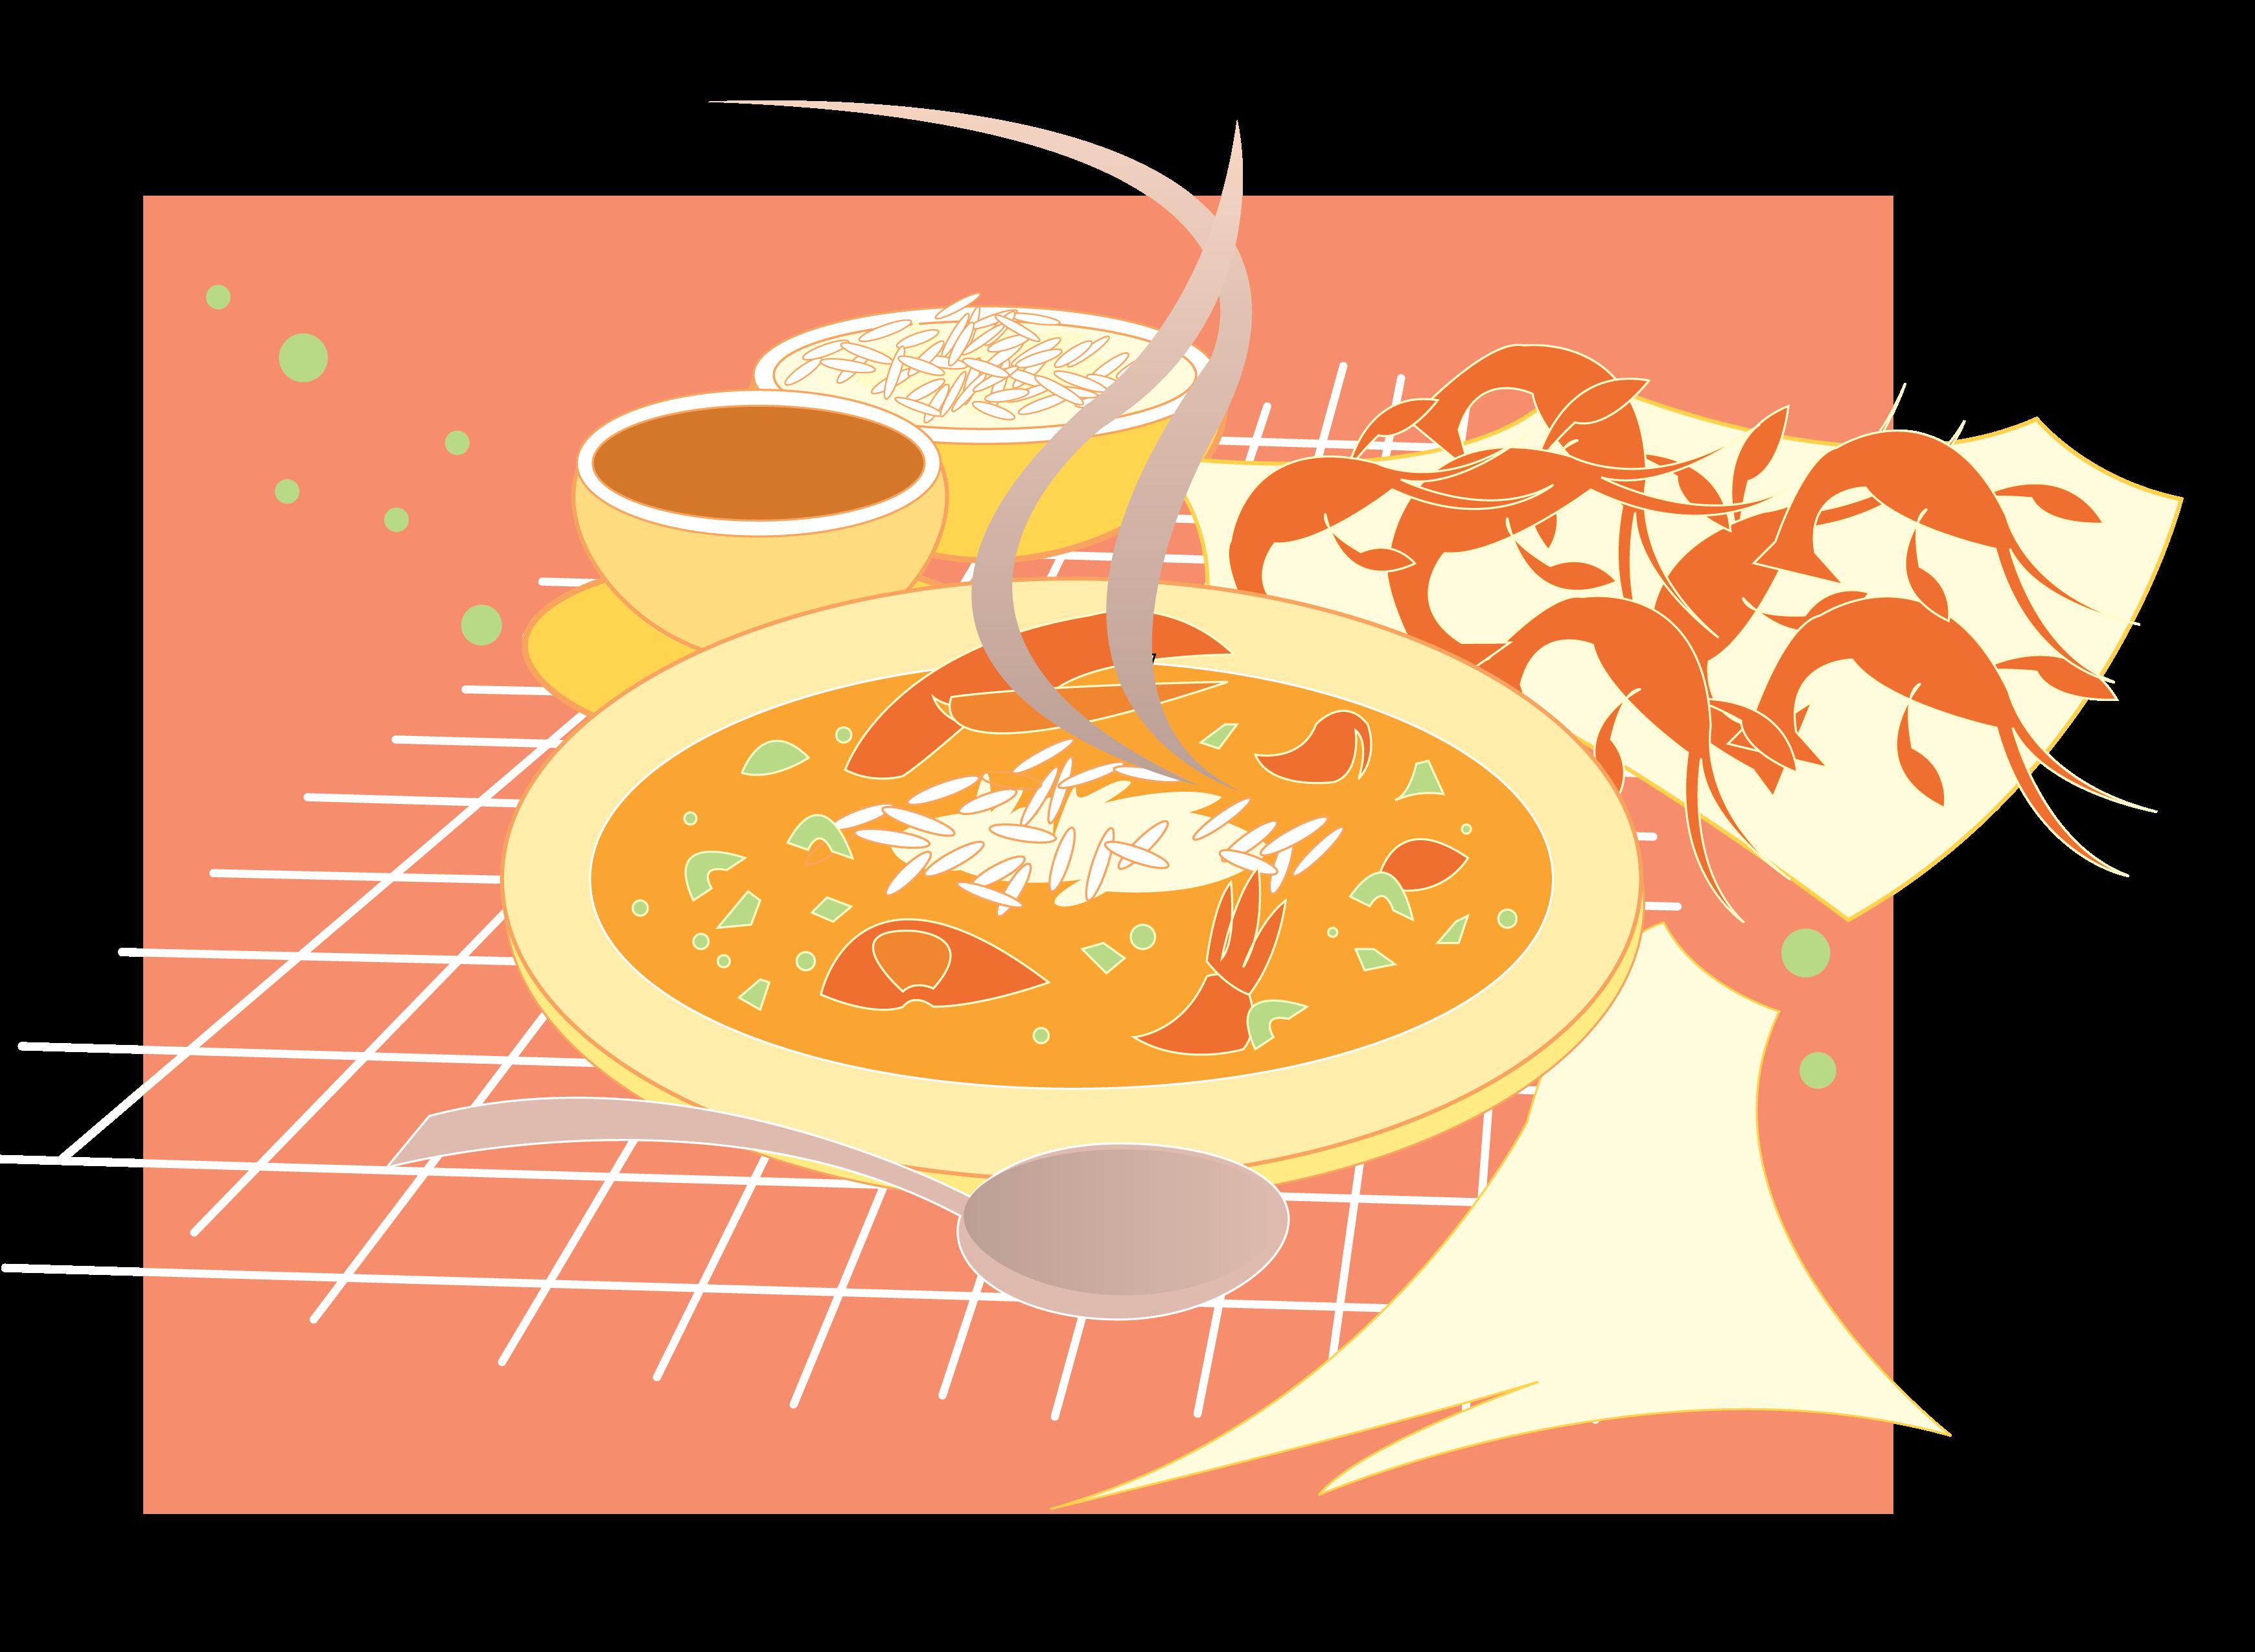 Cajun food clipart svg free download Cajun Food Clip Art - New Orleans Free Vector Clip Art svg free download